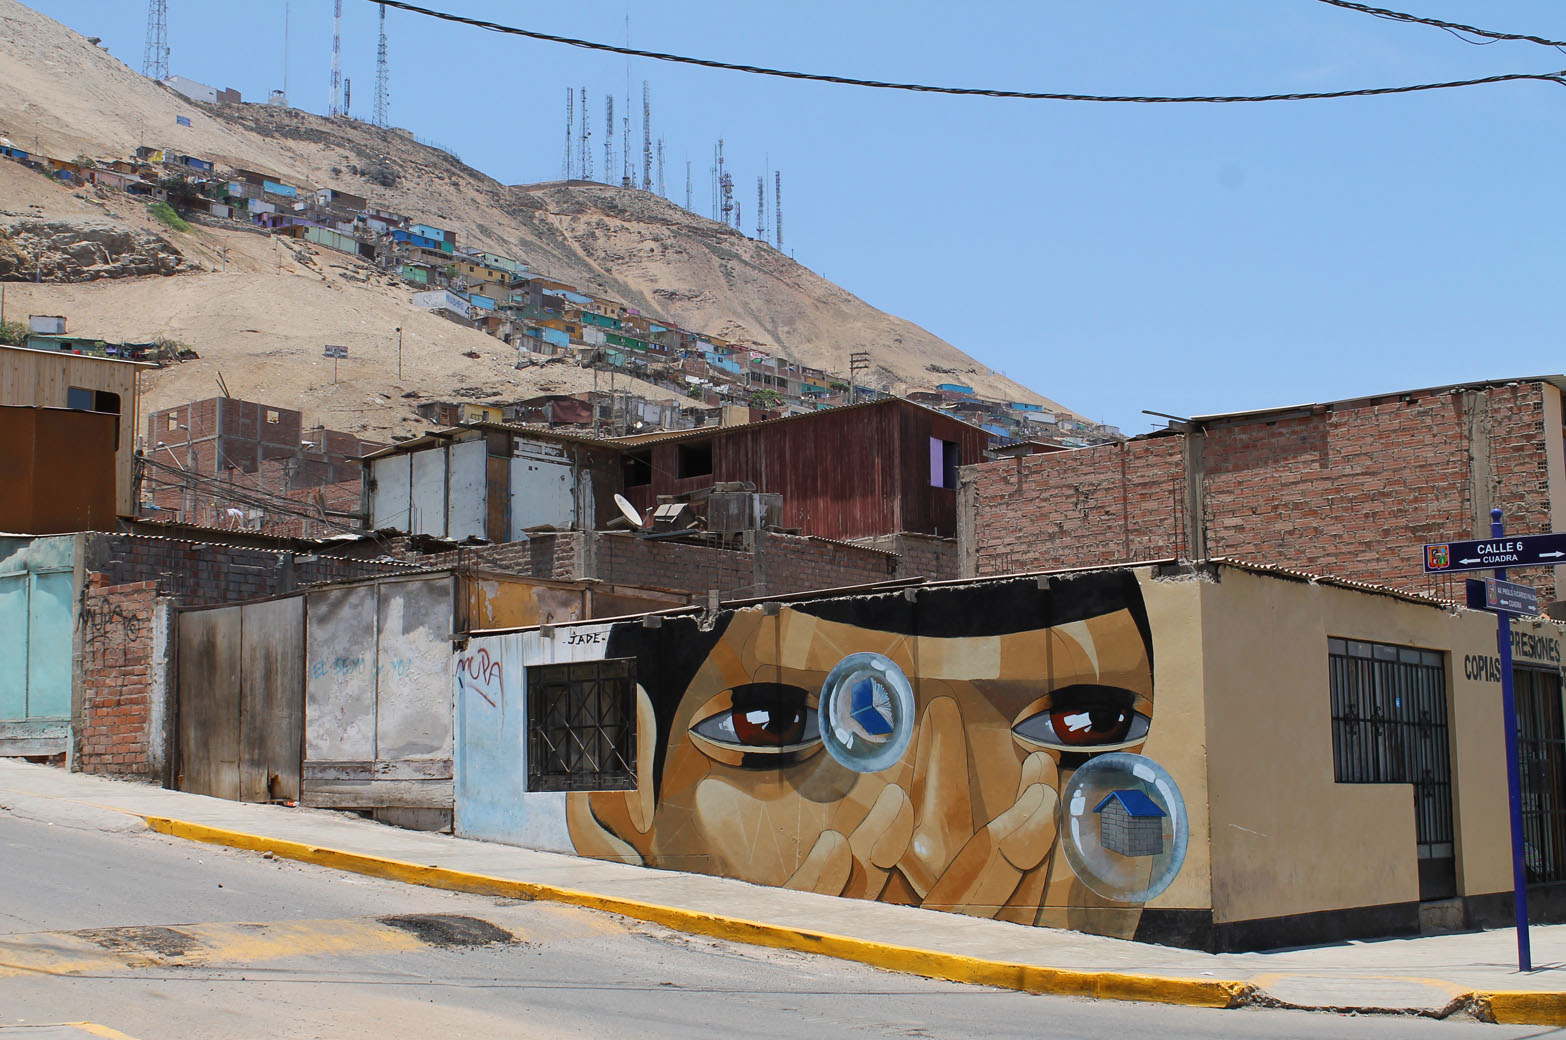 jade-pompas-de-jabon-new-mural-lima-05